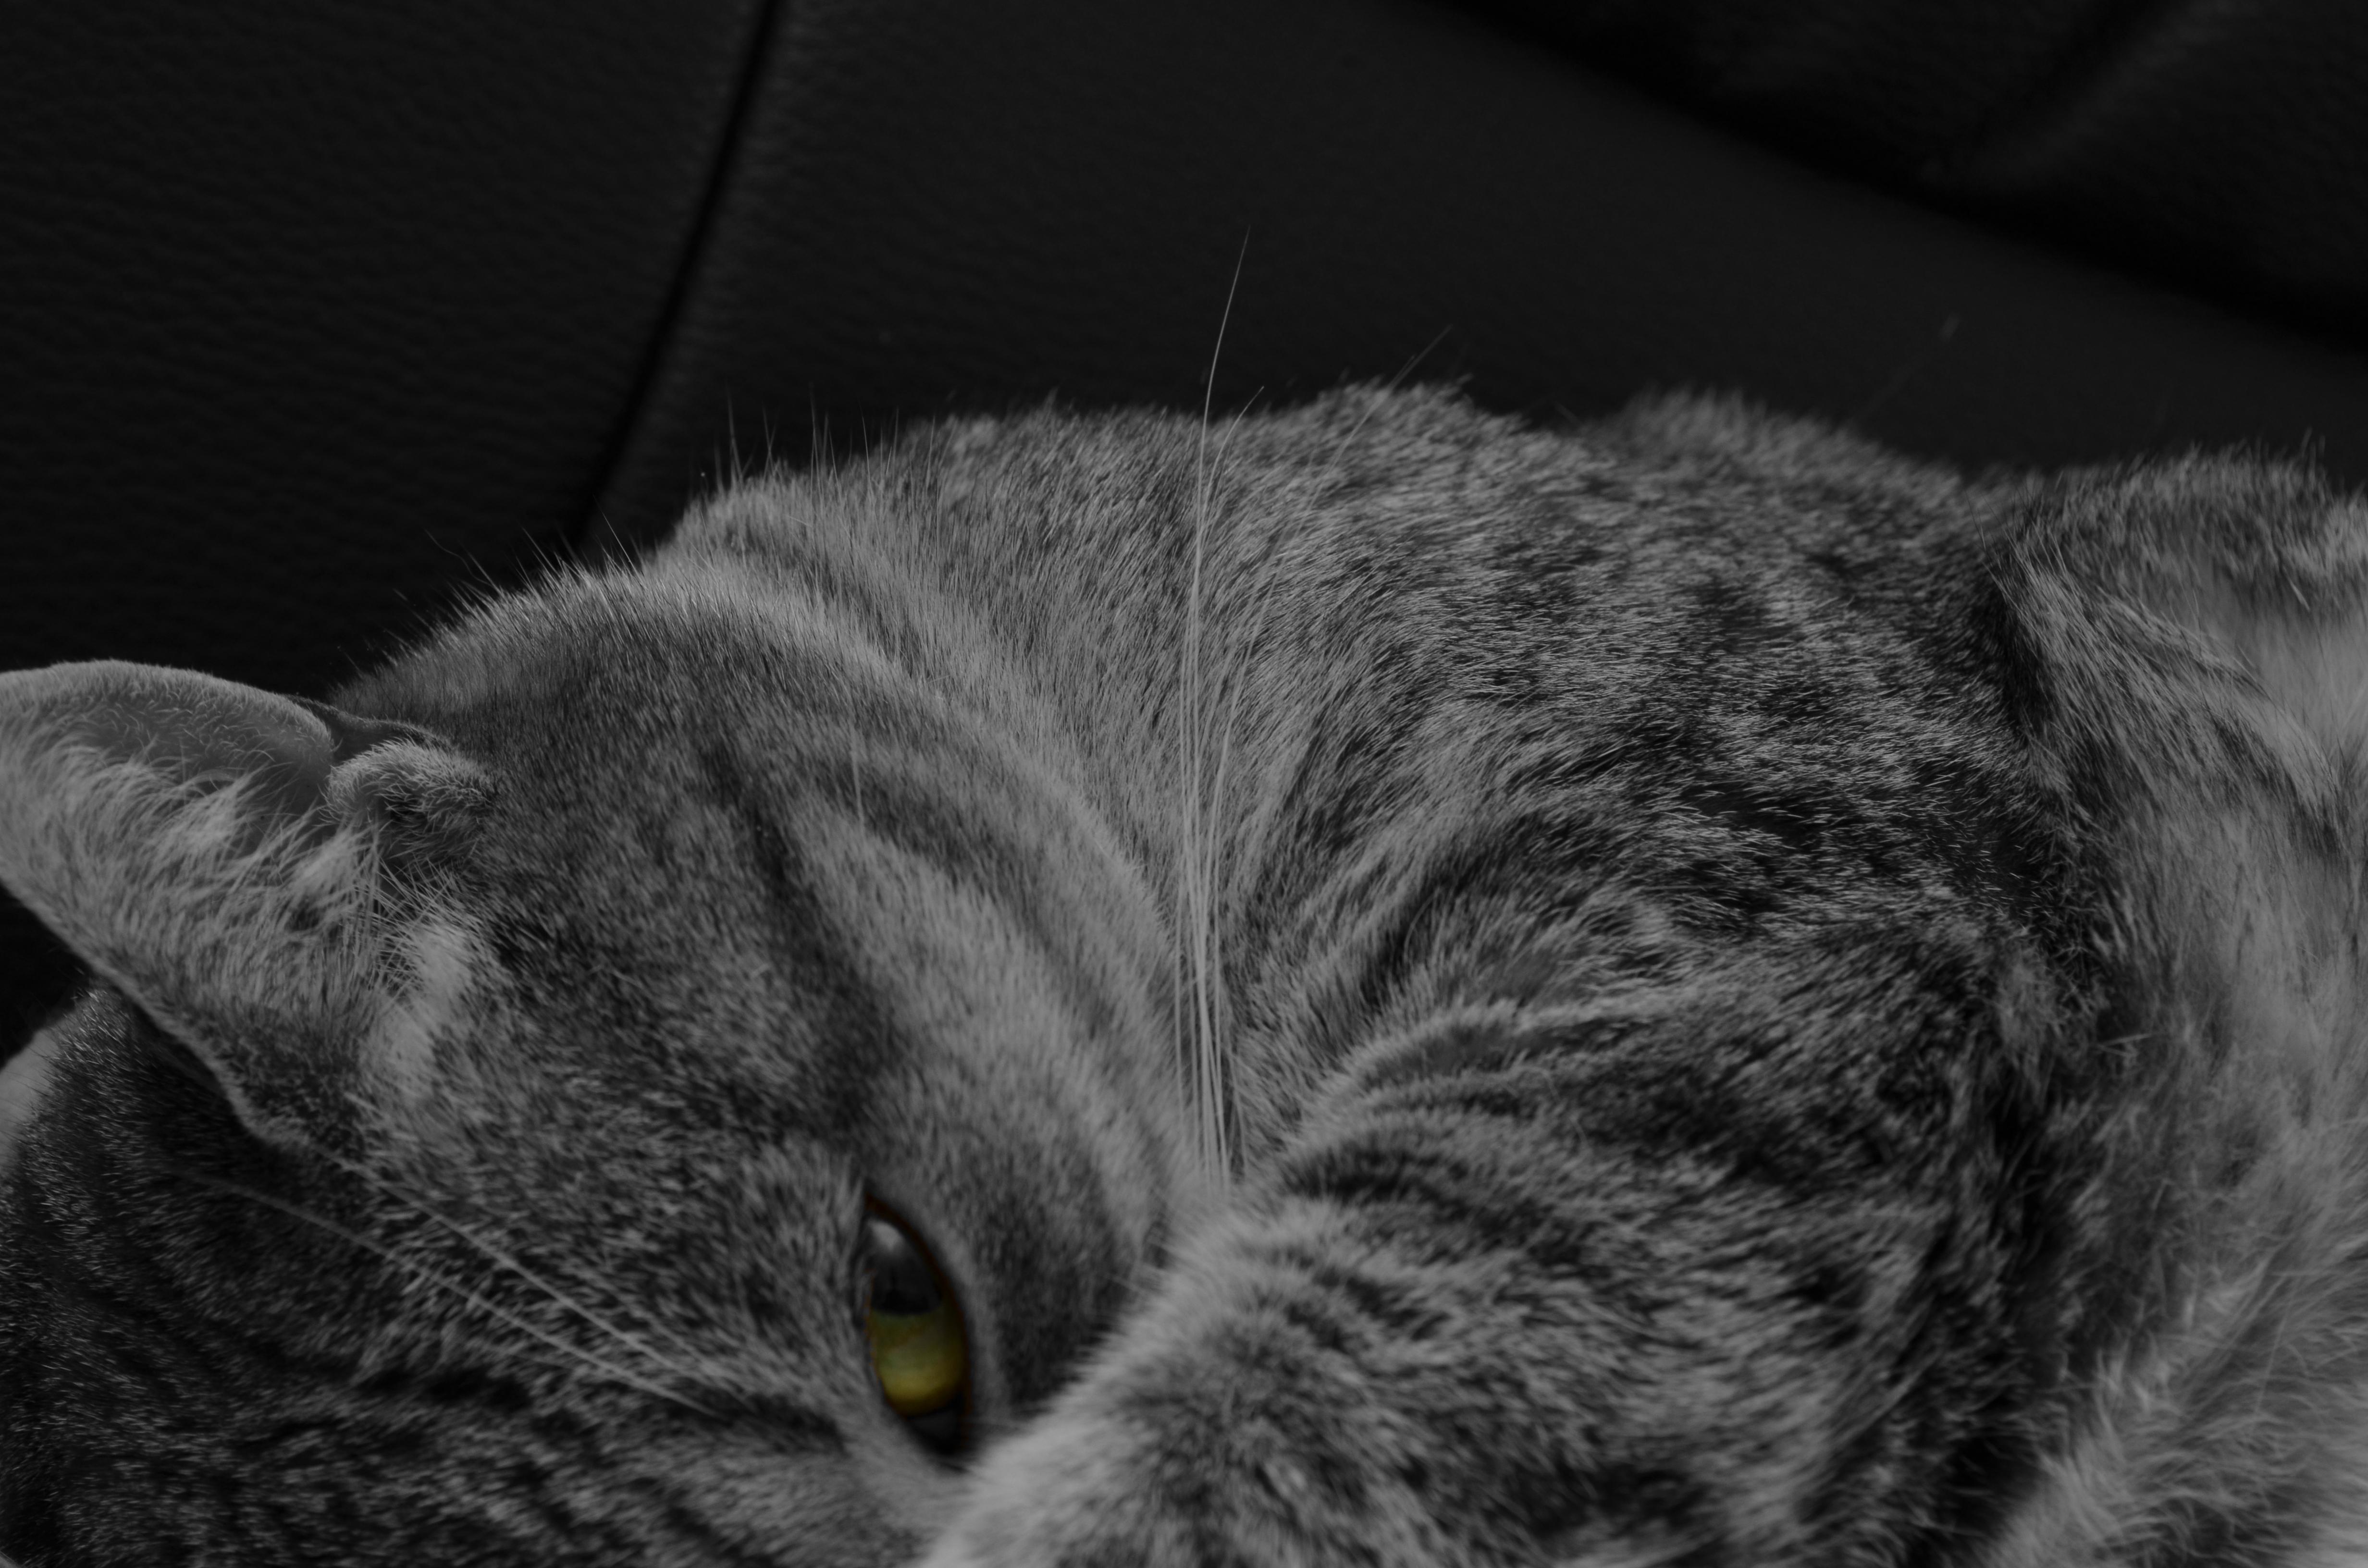 Cat - Shaila, Multicolor, Pet, Watching, Multi, HQ Photo